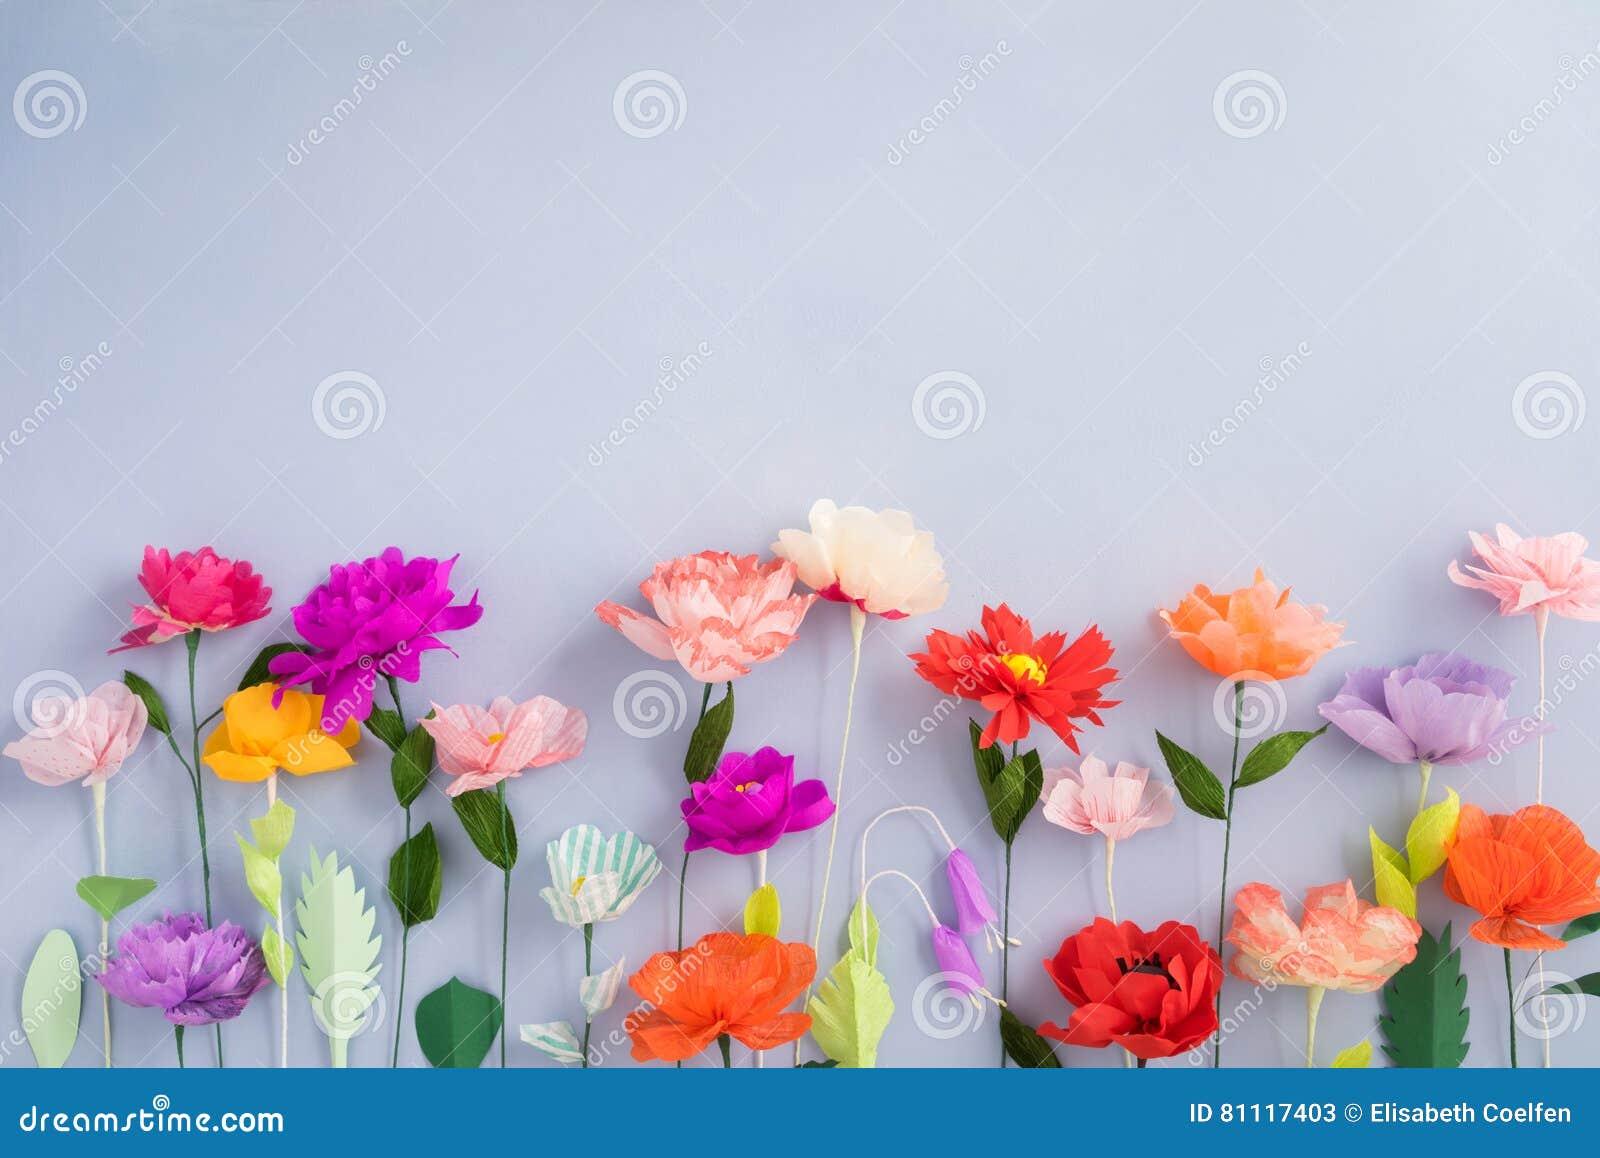 Handmade paper flowers stock image image of handicraft 81117403 download handmade paper flowers stock image image of handicraft 81117403 mightylinksfo